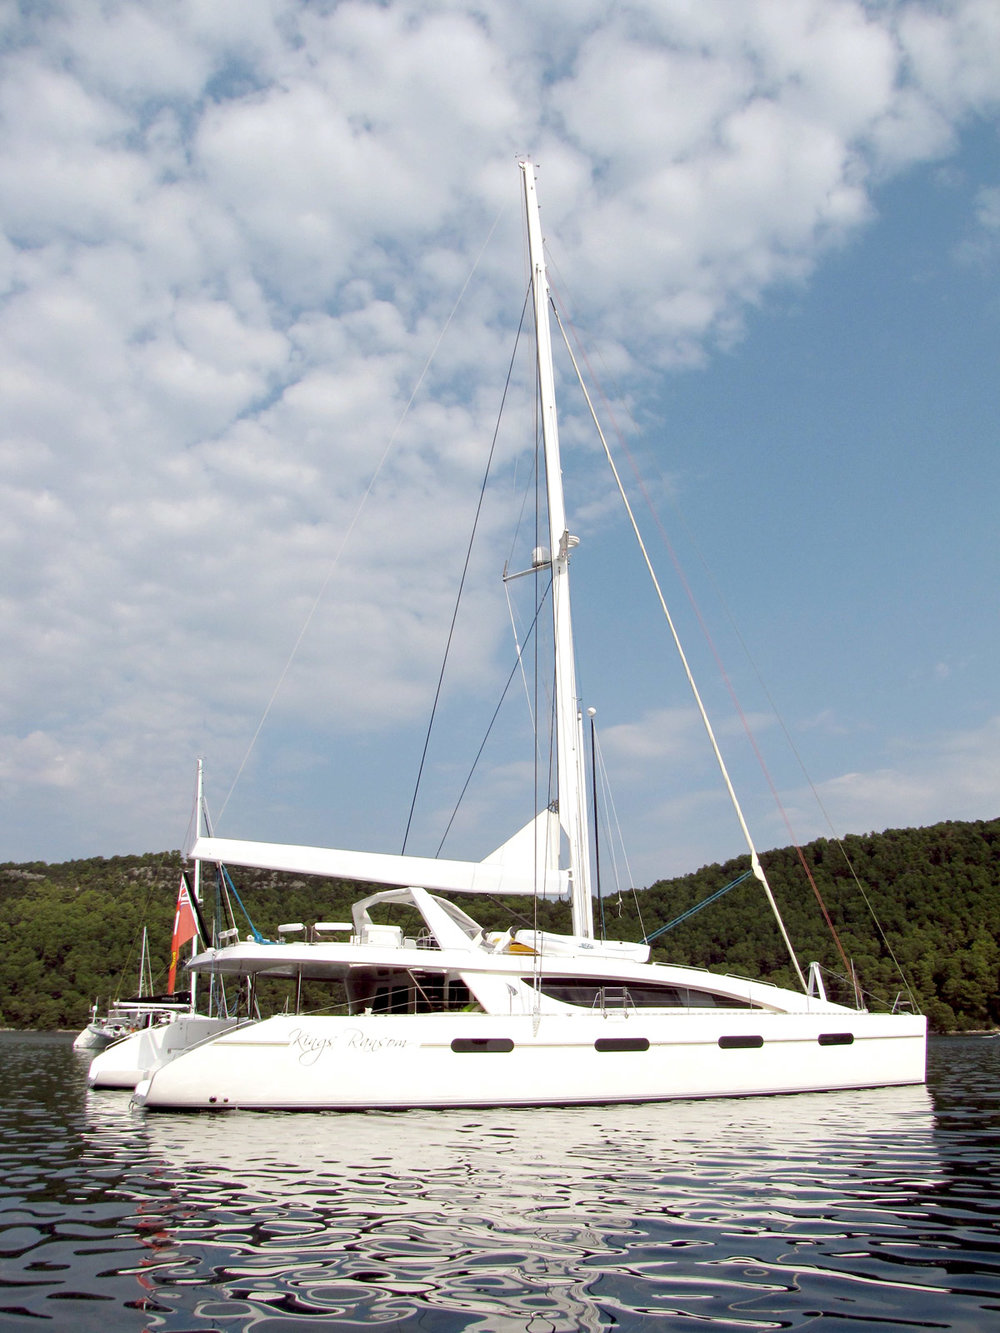 kings-ransom-catamaran-anchored.jpg